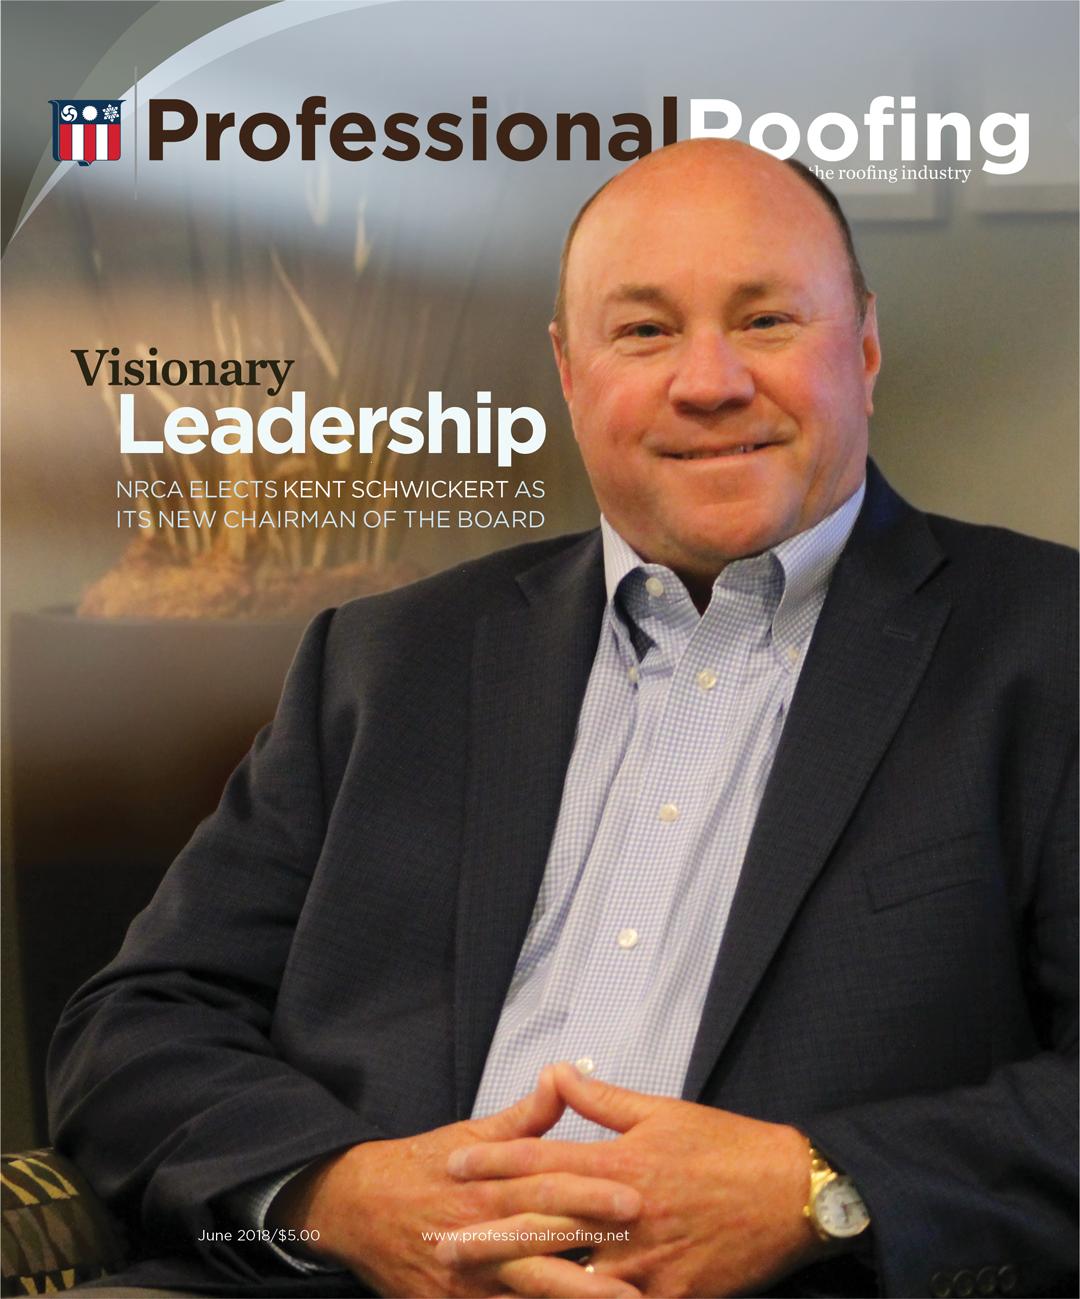 Professional Roofing Magazine 6/1/2018